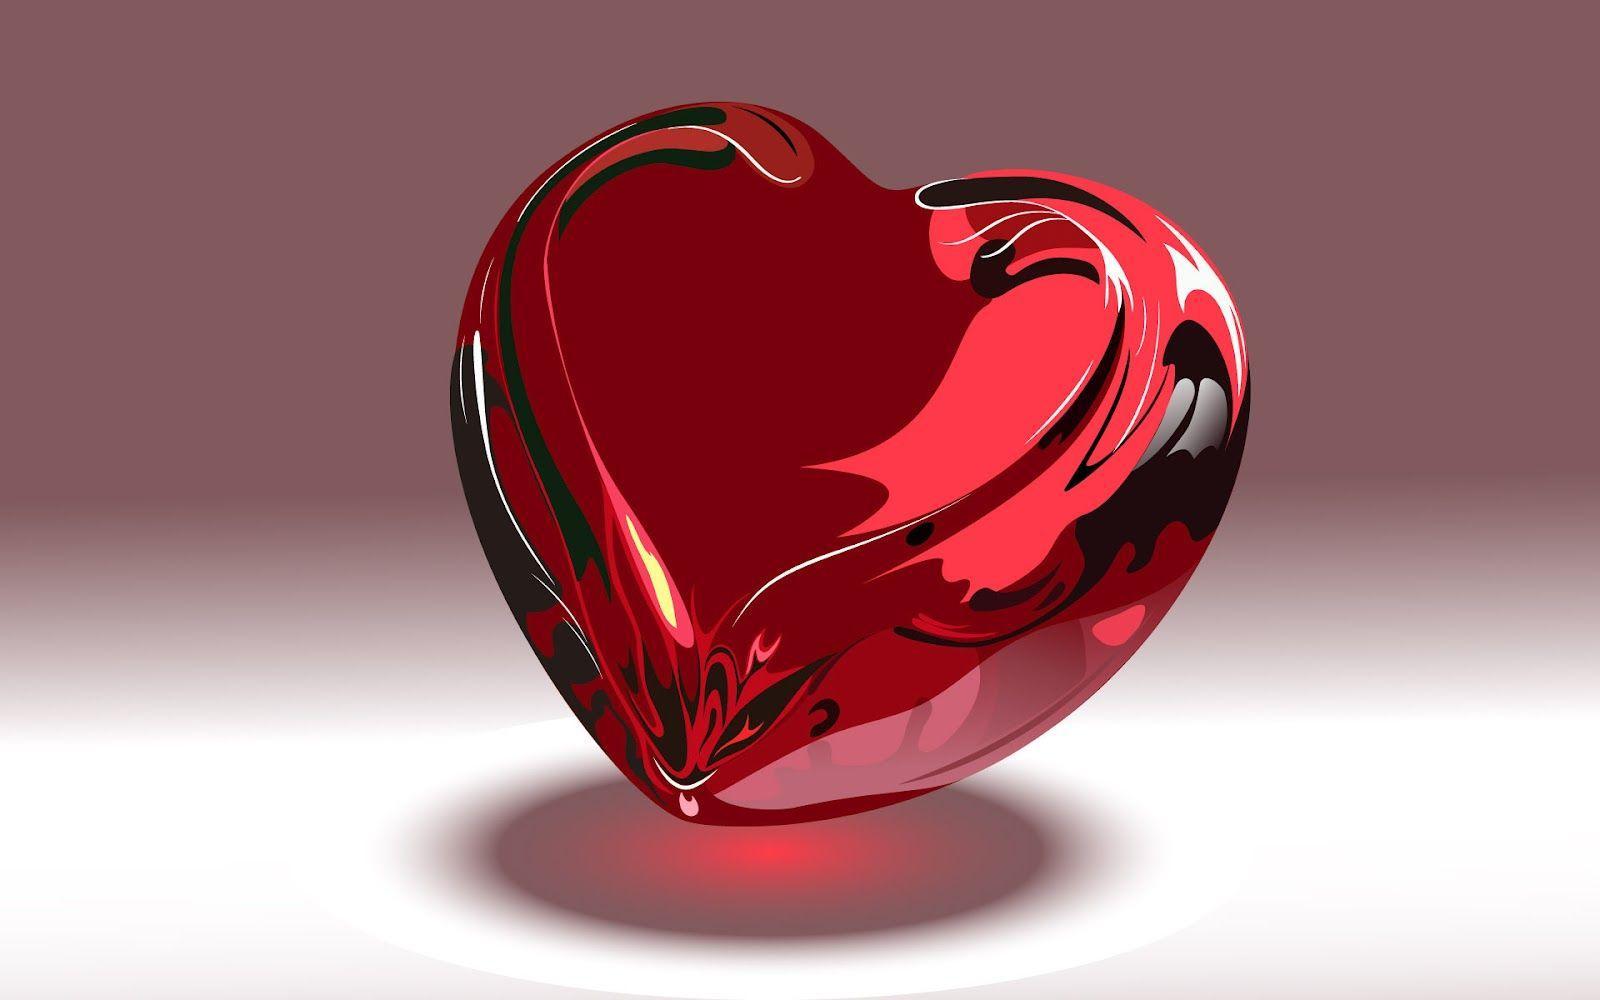 Wallpaper download love you - I Love You Desktop Wallpaper 30 Wallpapernesia